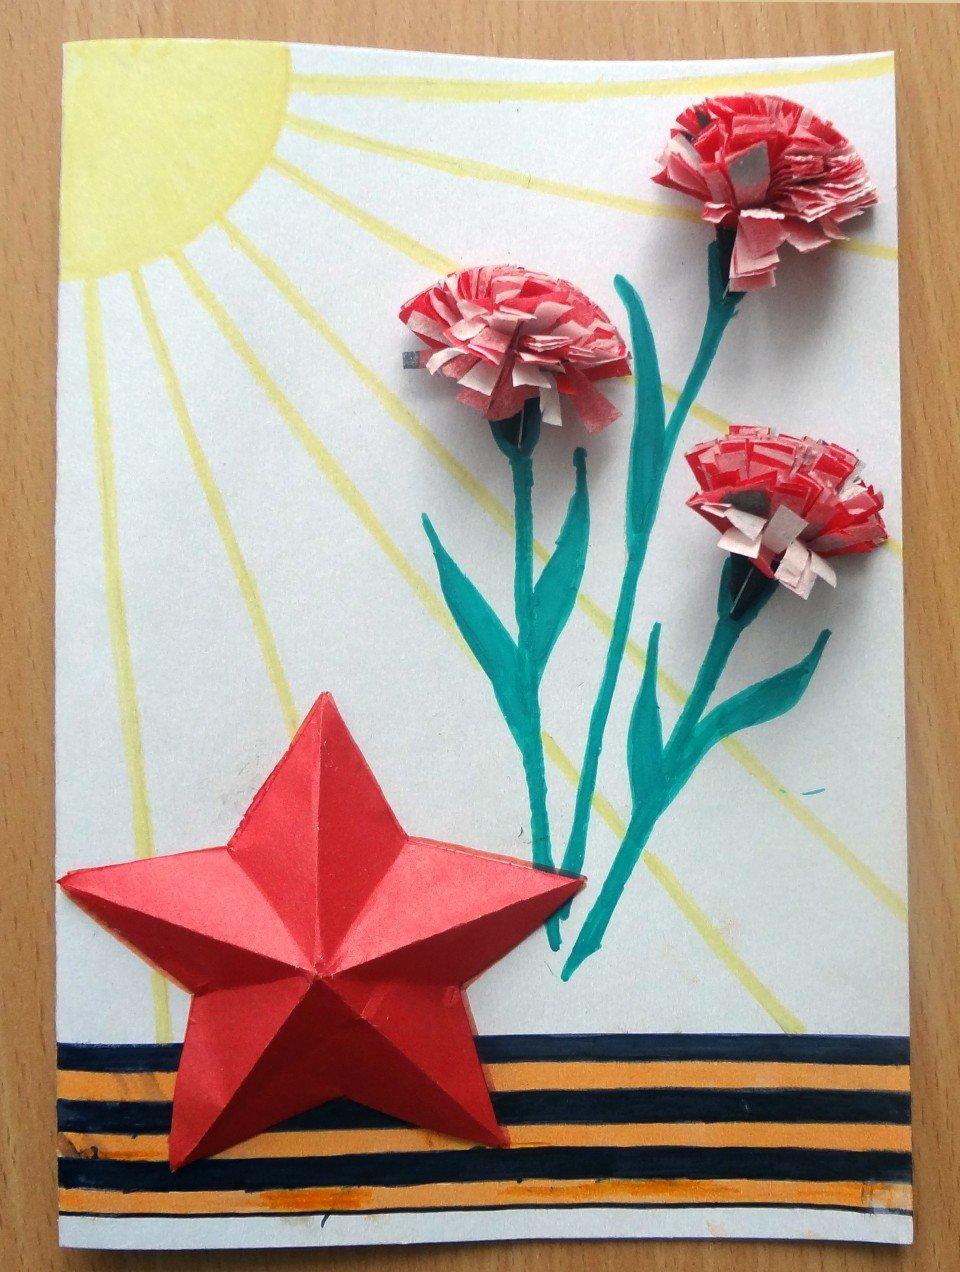 3 класс открытка к 9 мая, юбилеем